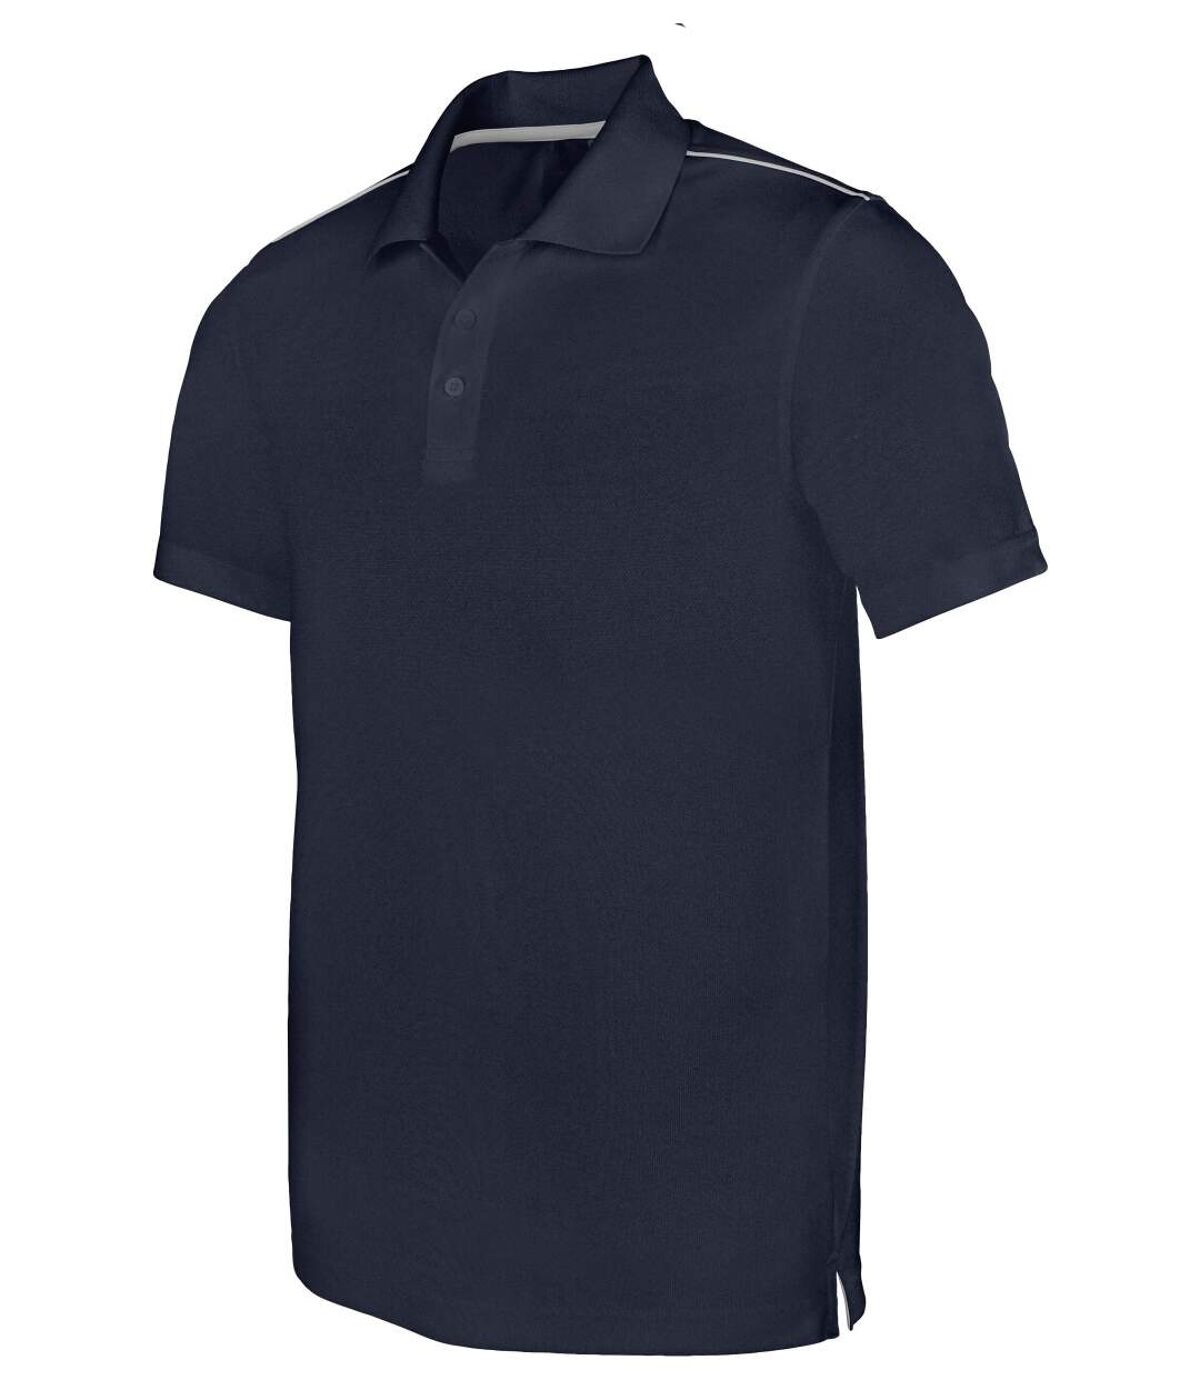 Polo homme sport - PA480 - bleu marine - manches courtes